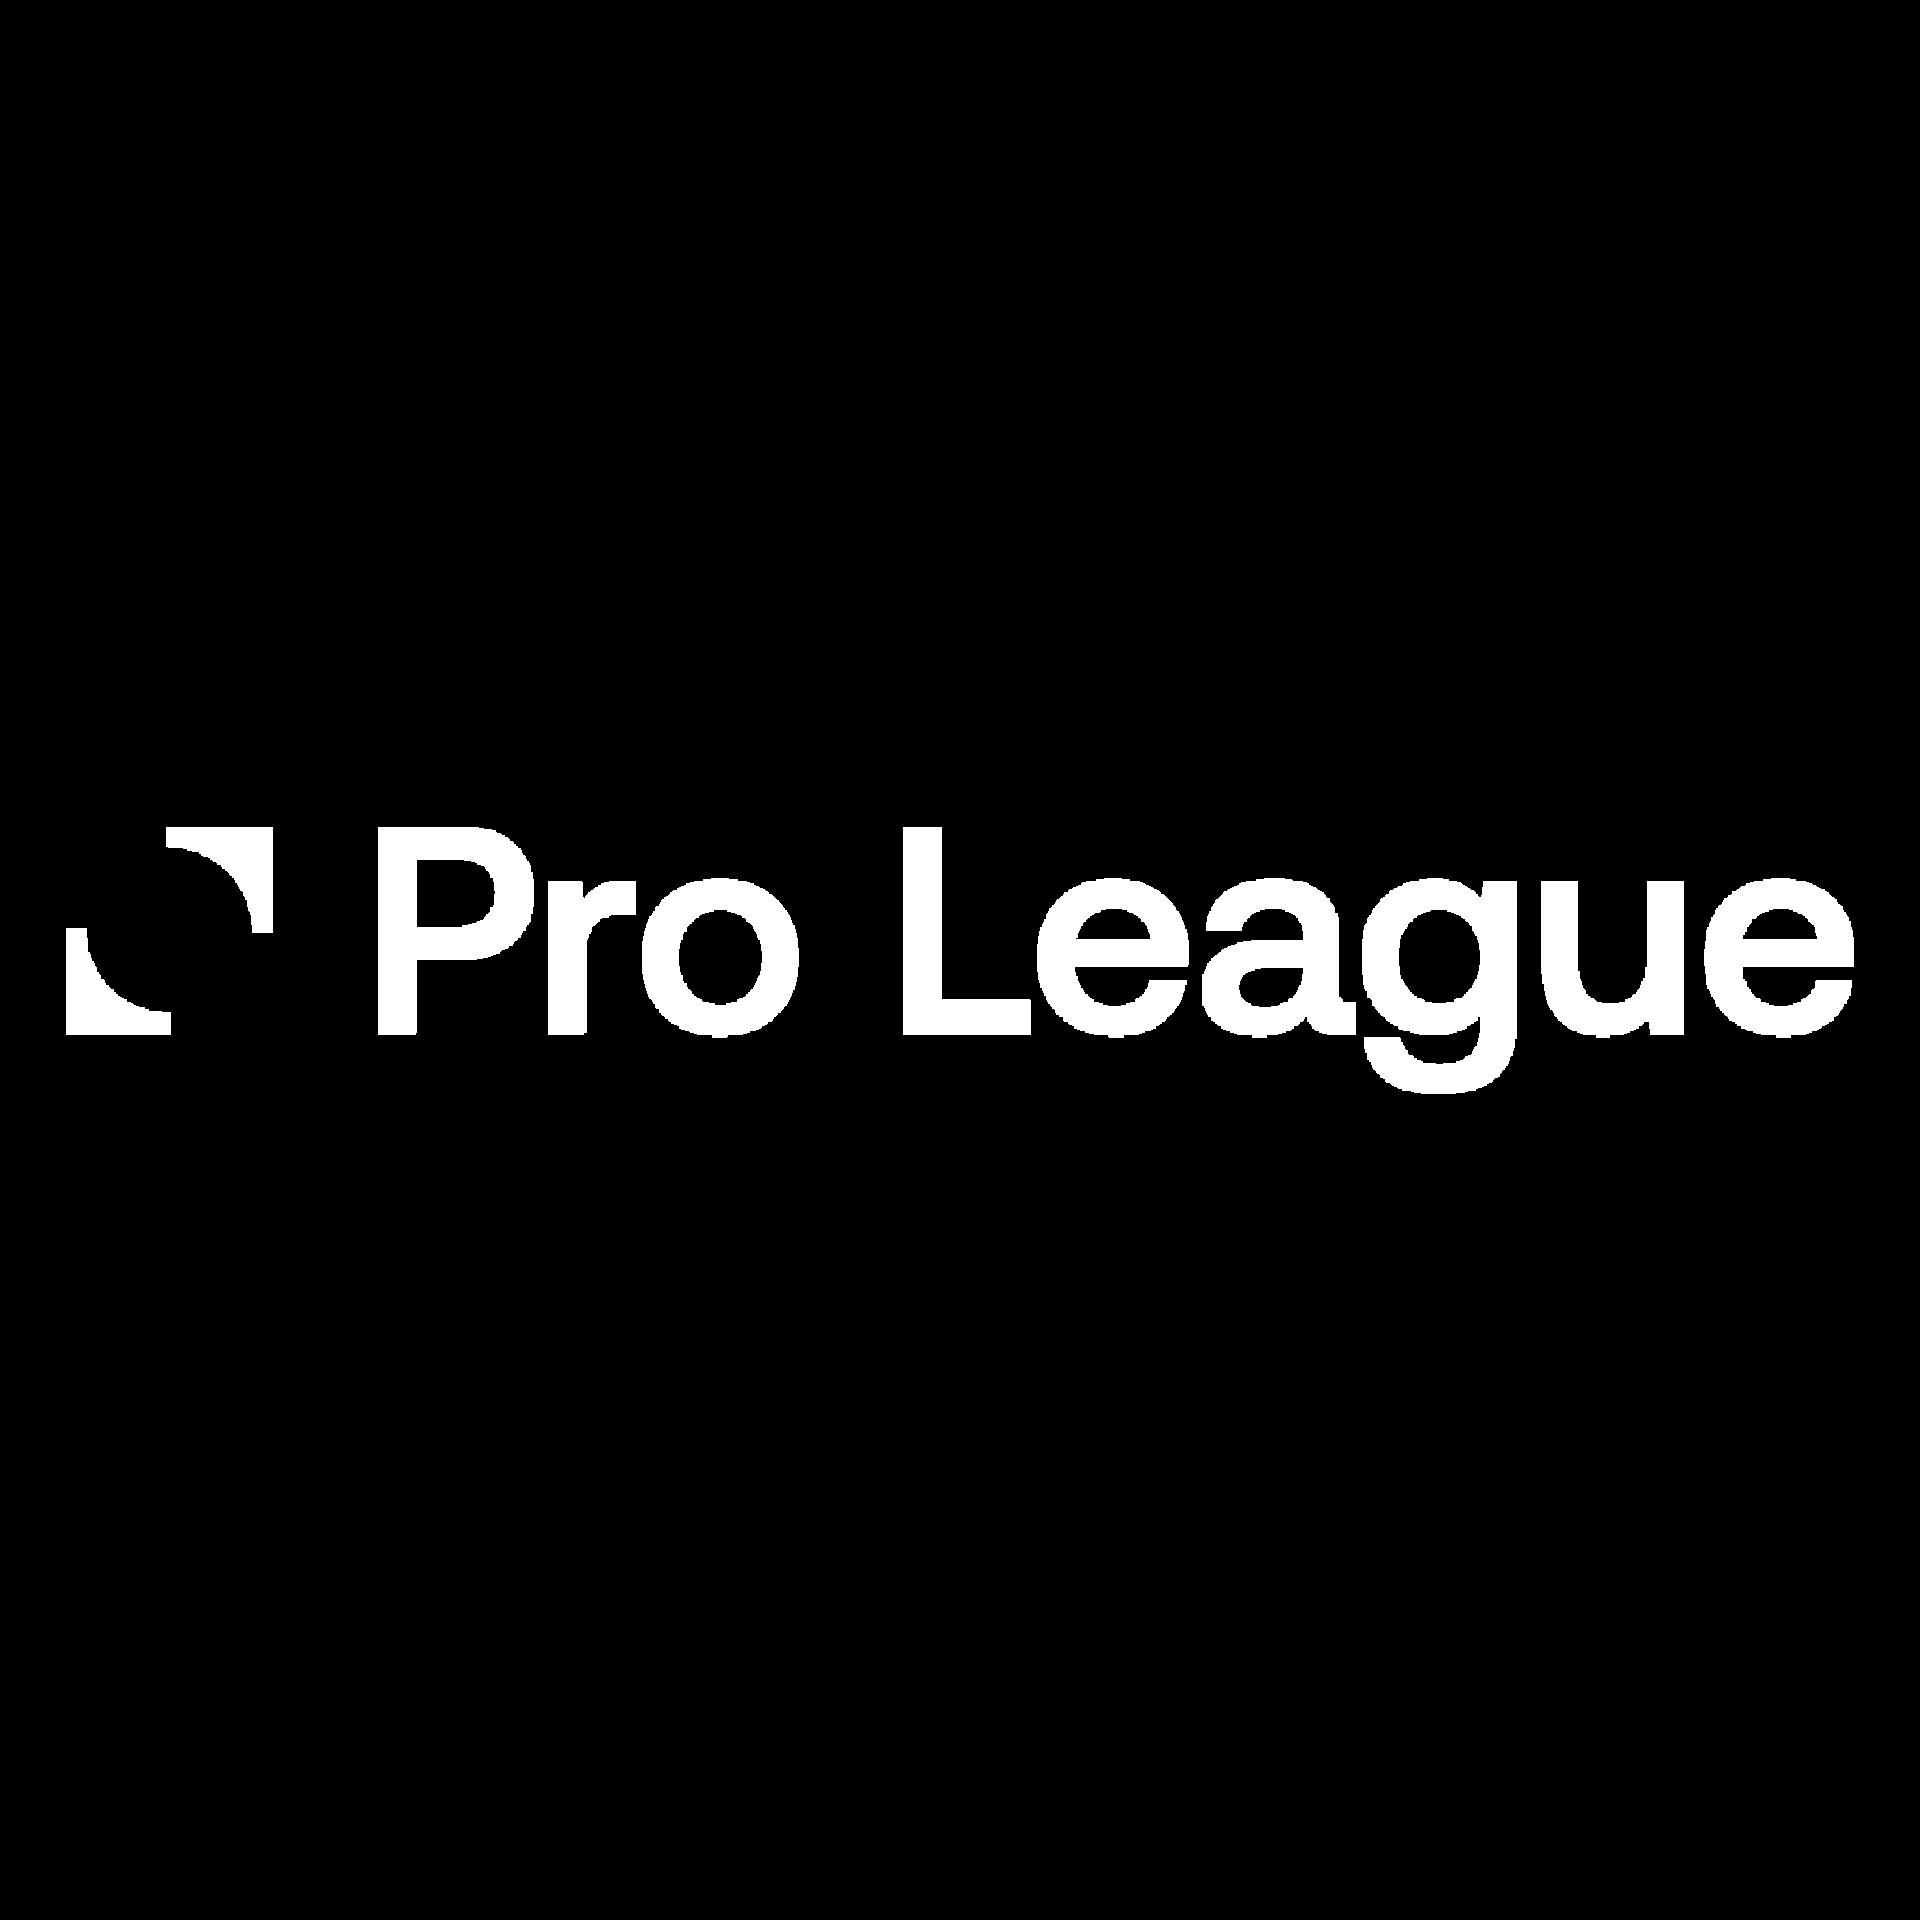 Eleven Pro League Transfer